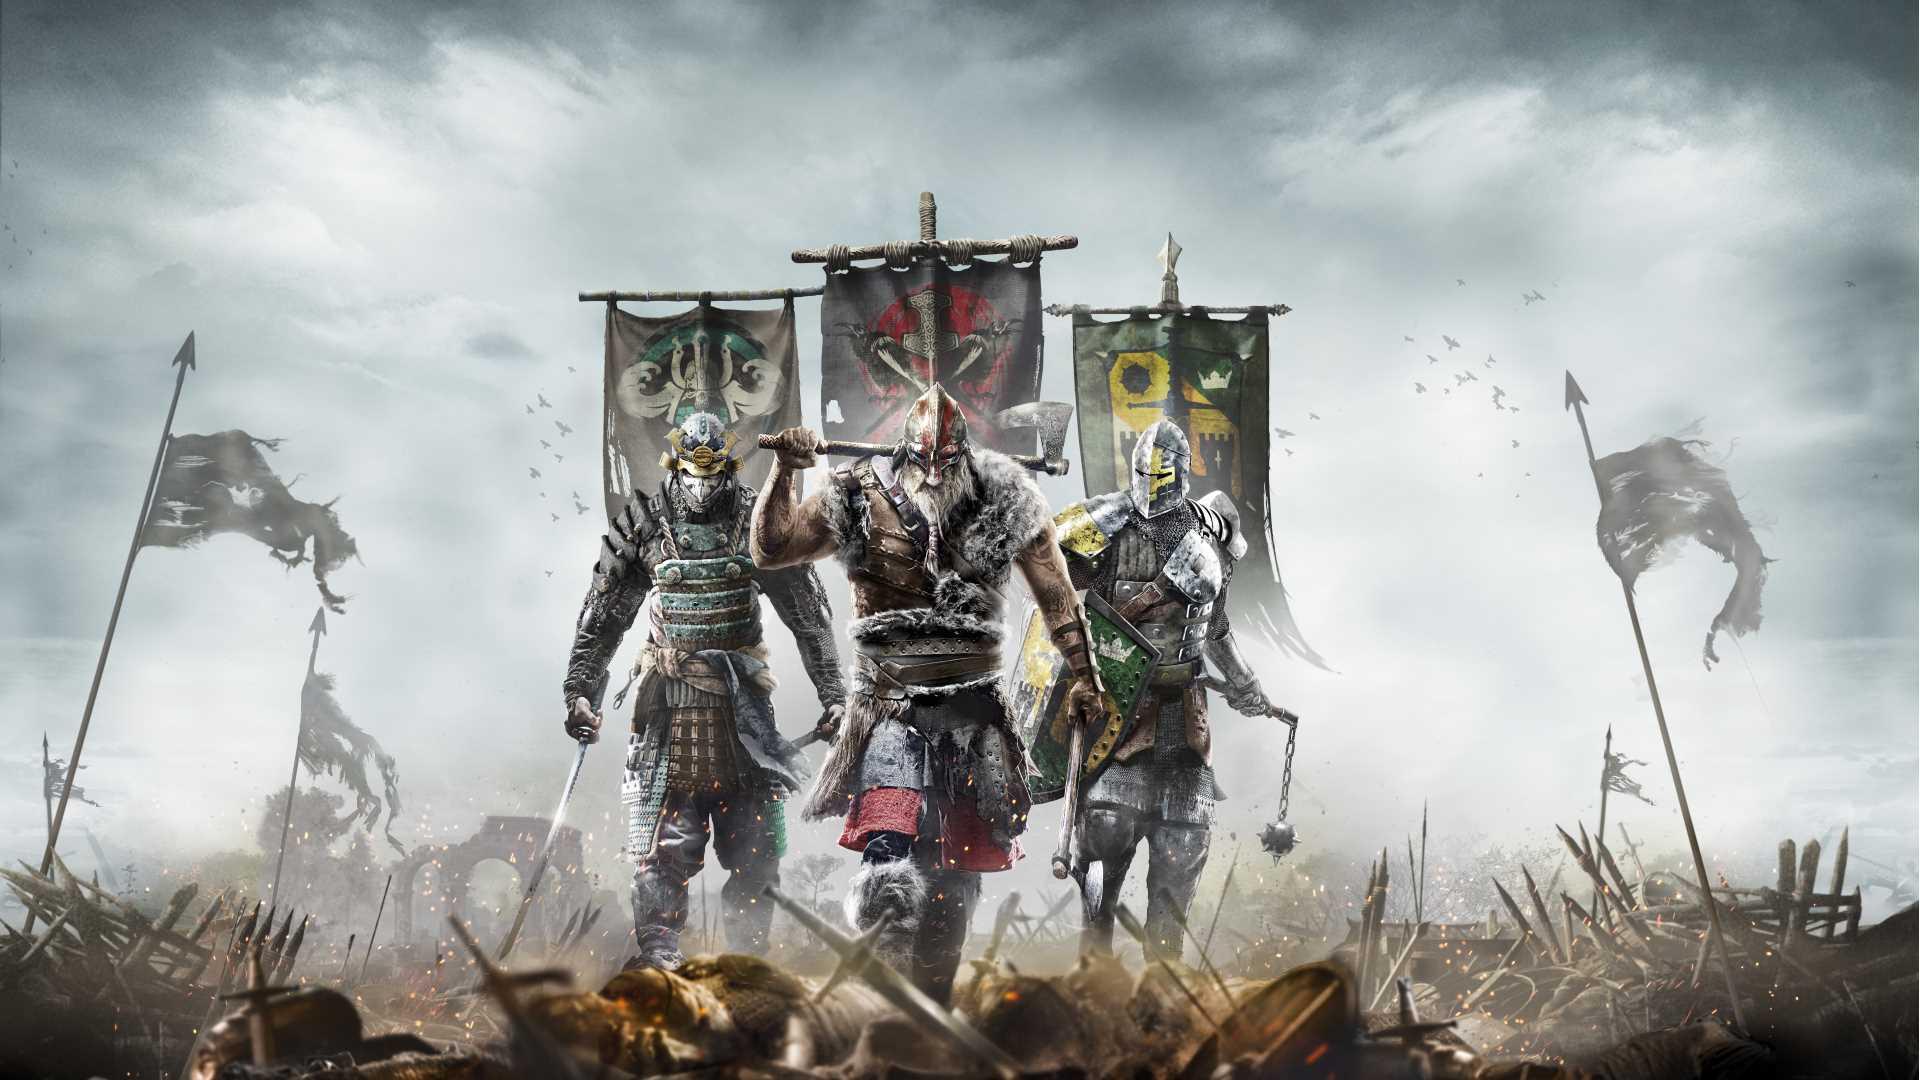 forhonor 01 1 - سی دی کی اورجینال For Honor - Battle Pass - Year 4 Season 2